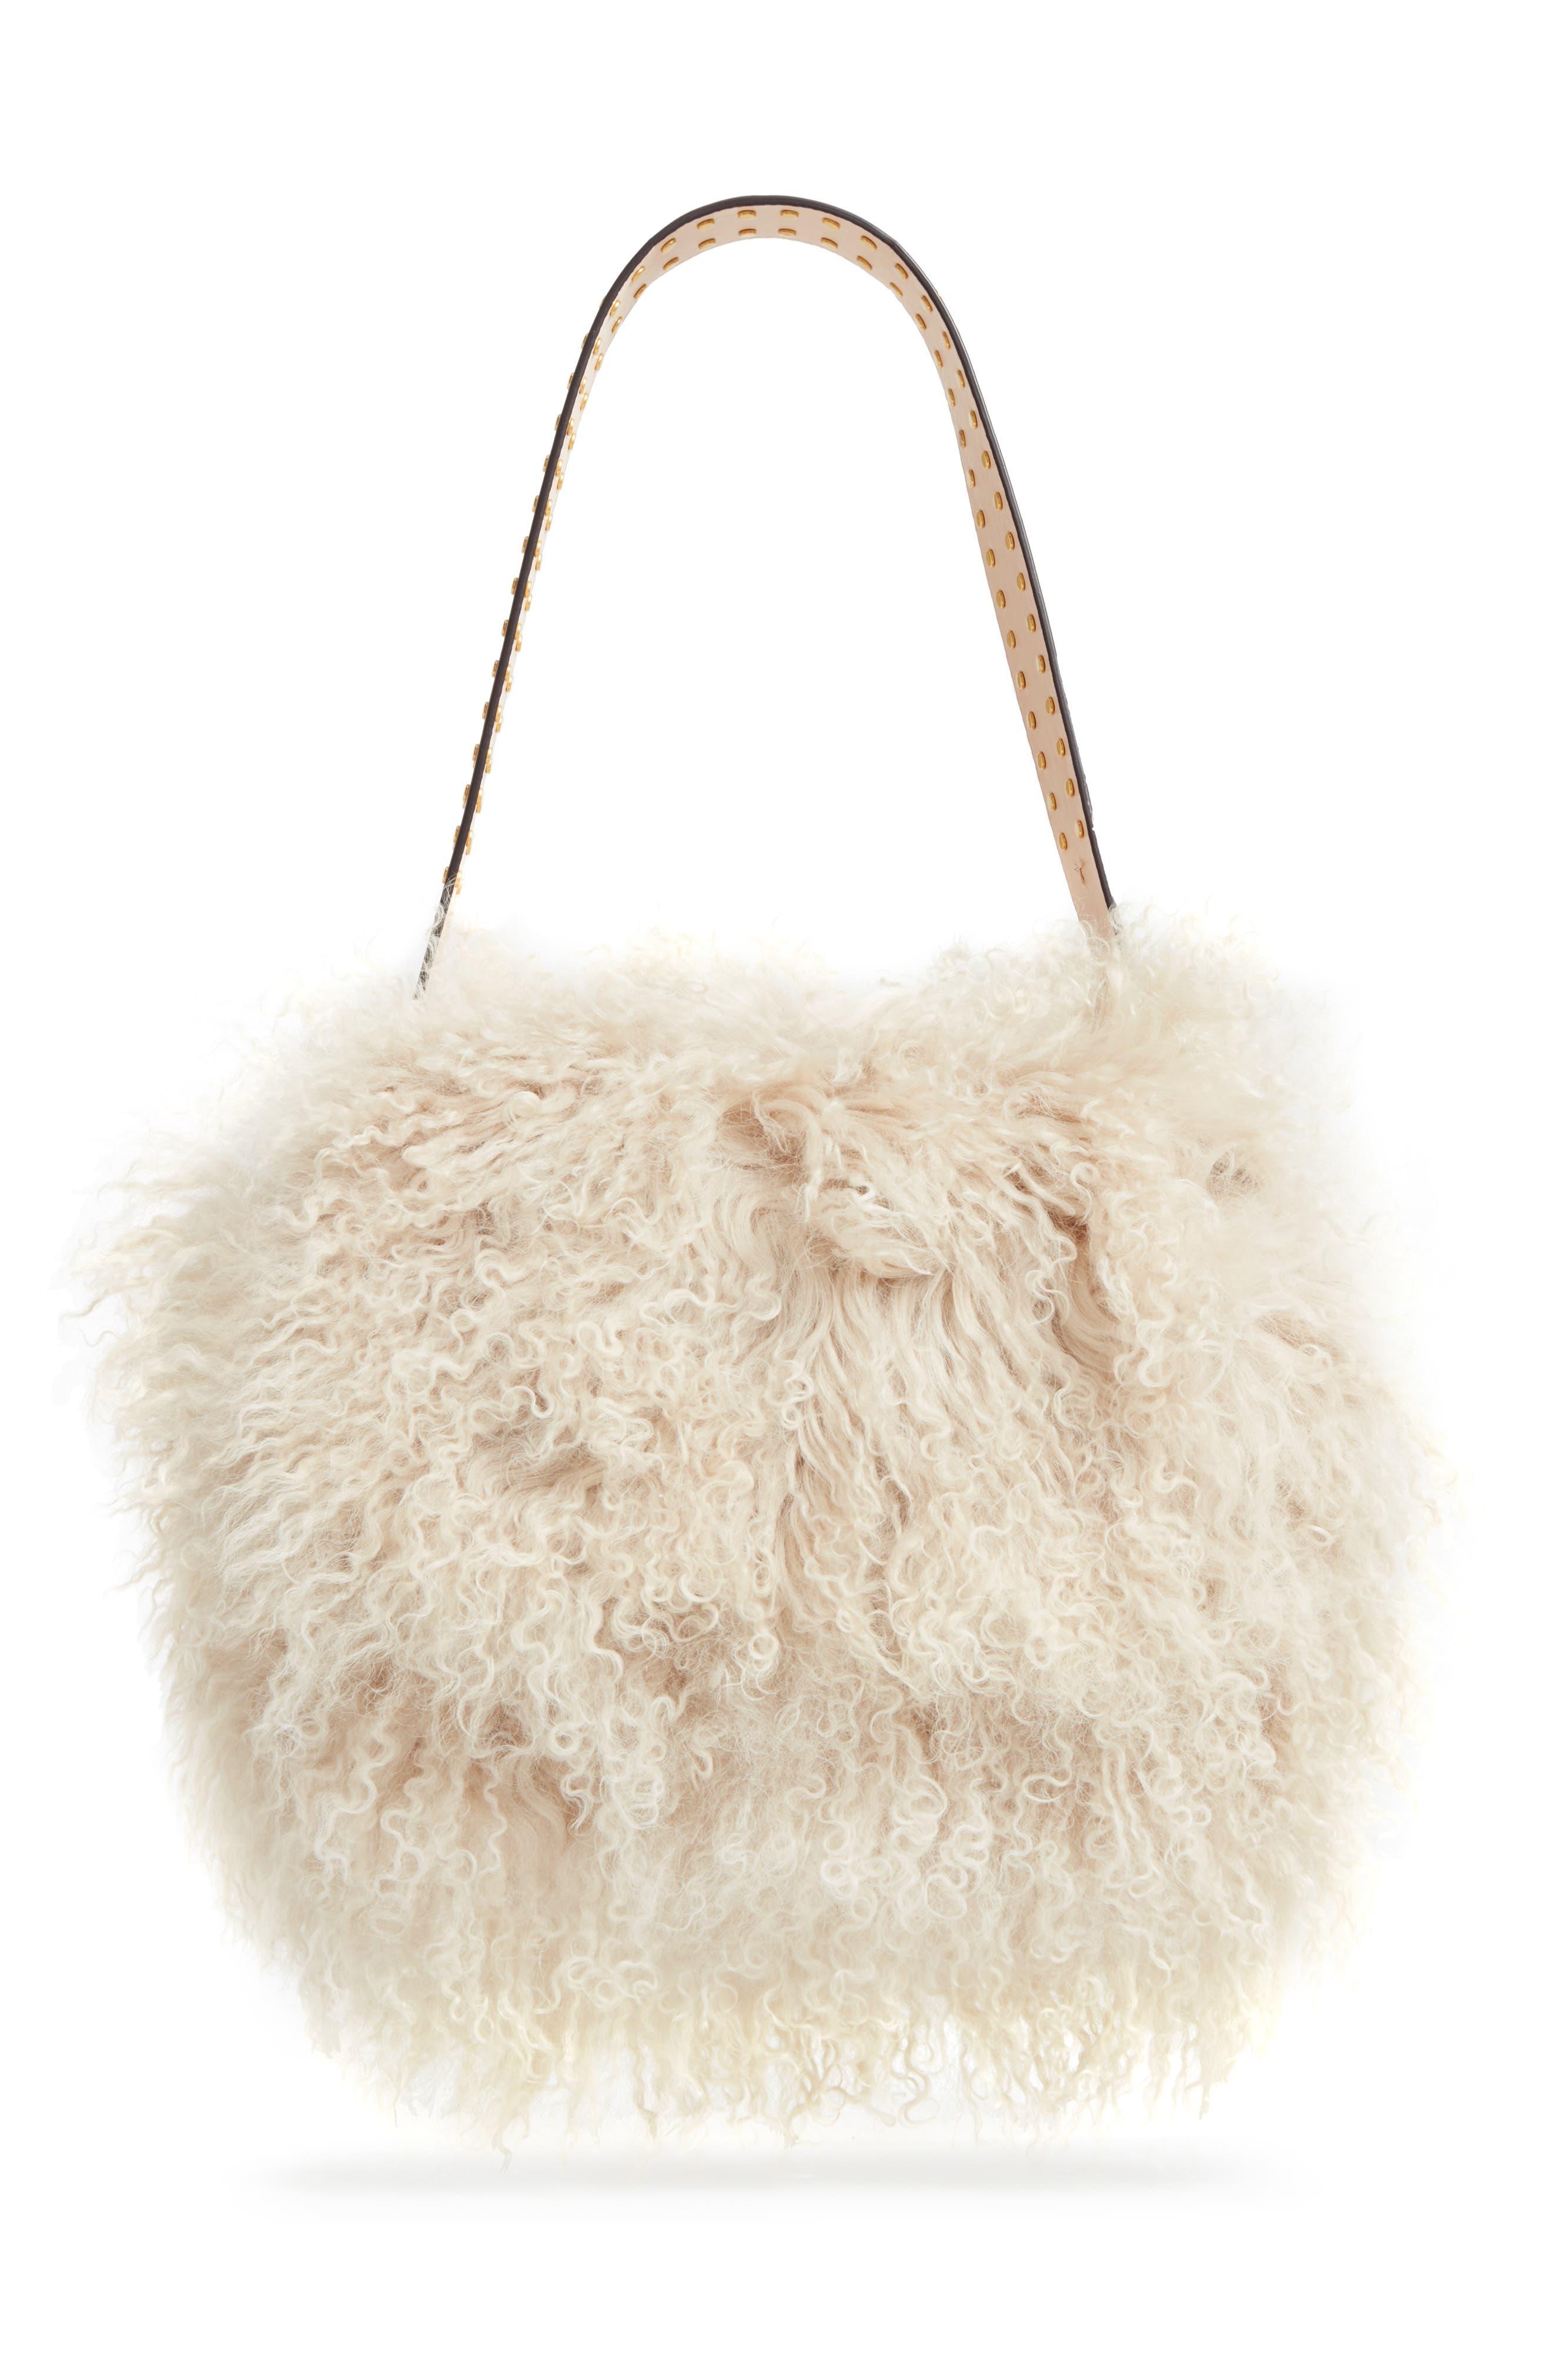 Alternate Image 1 Selected - Tory Burch Sawyer Genuine Shearling Shoulder Bag